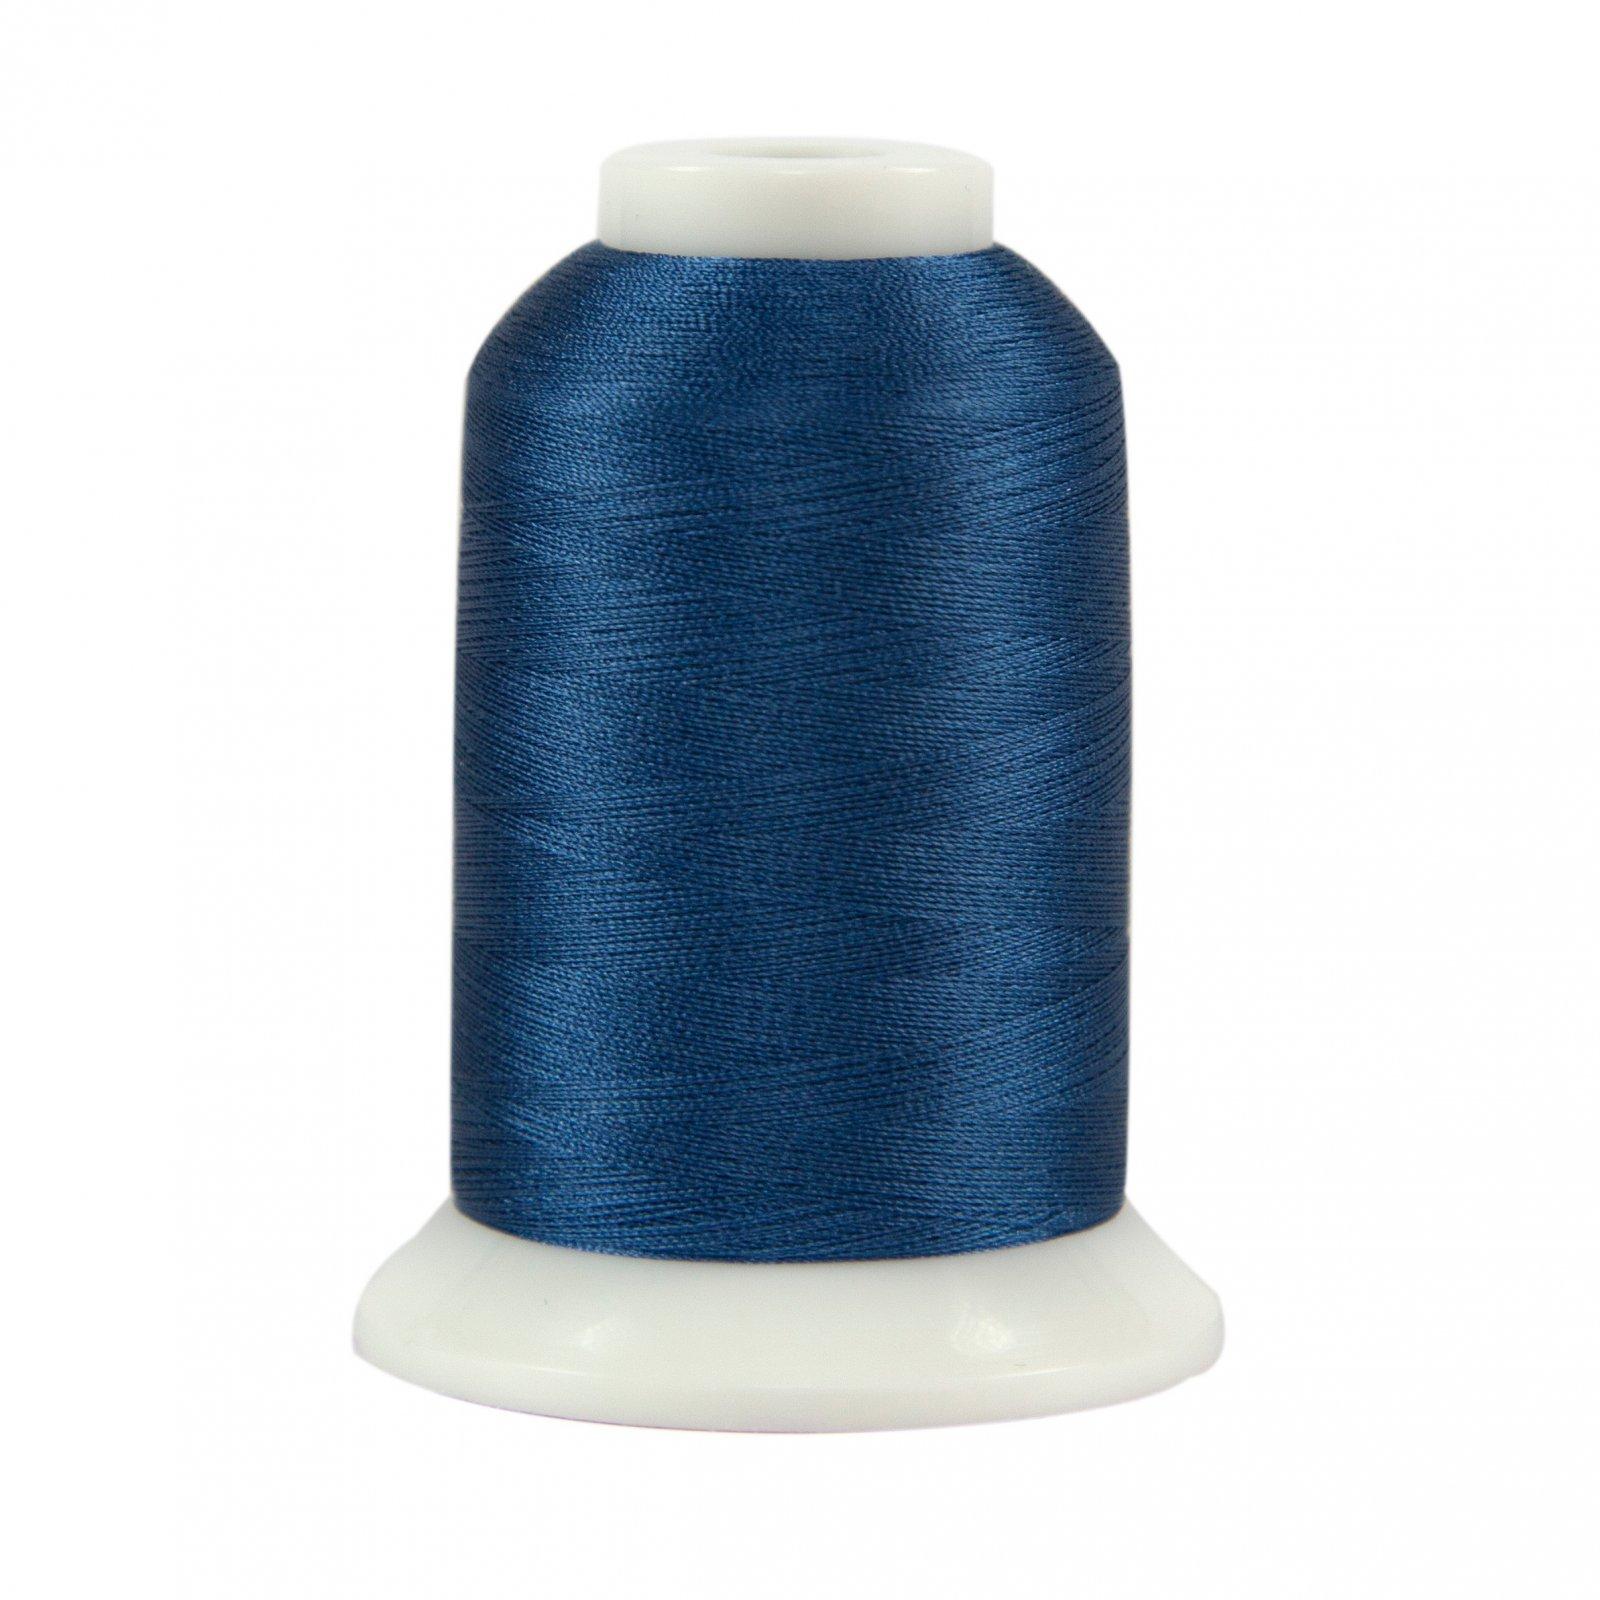 Kimono Silk Thread 100wt 1090yd Rondon Blue